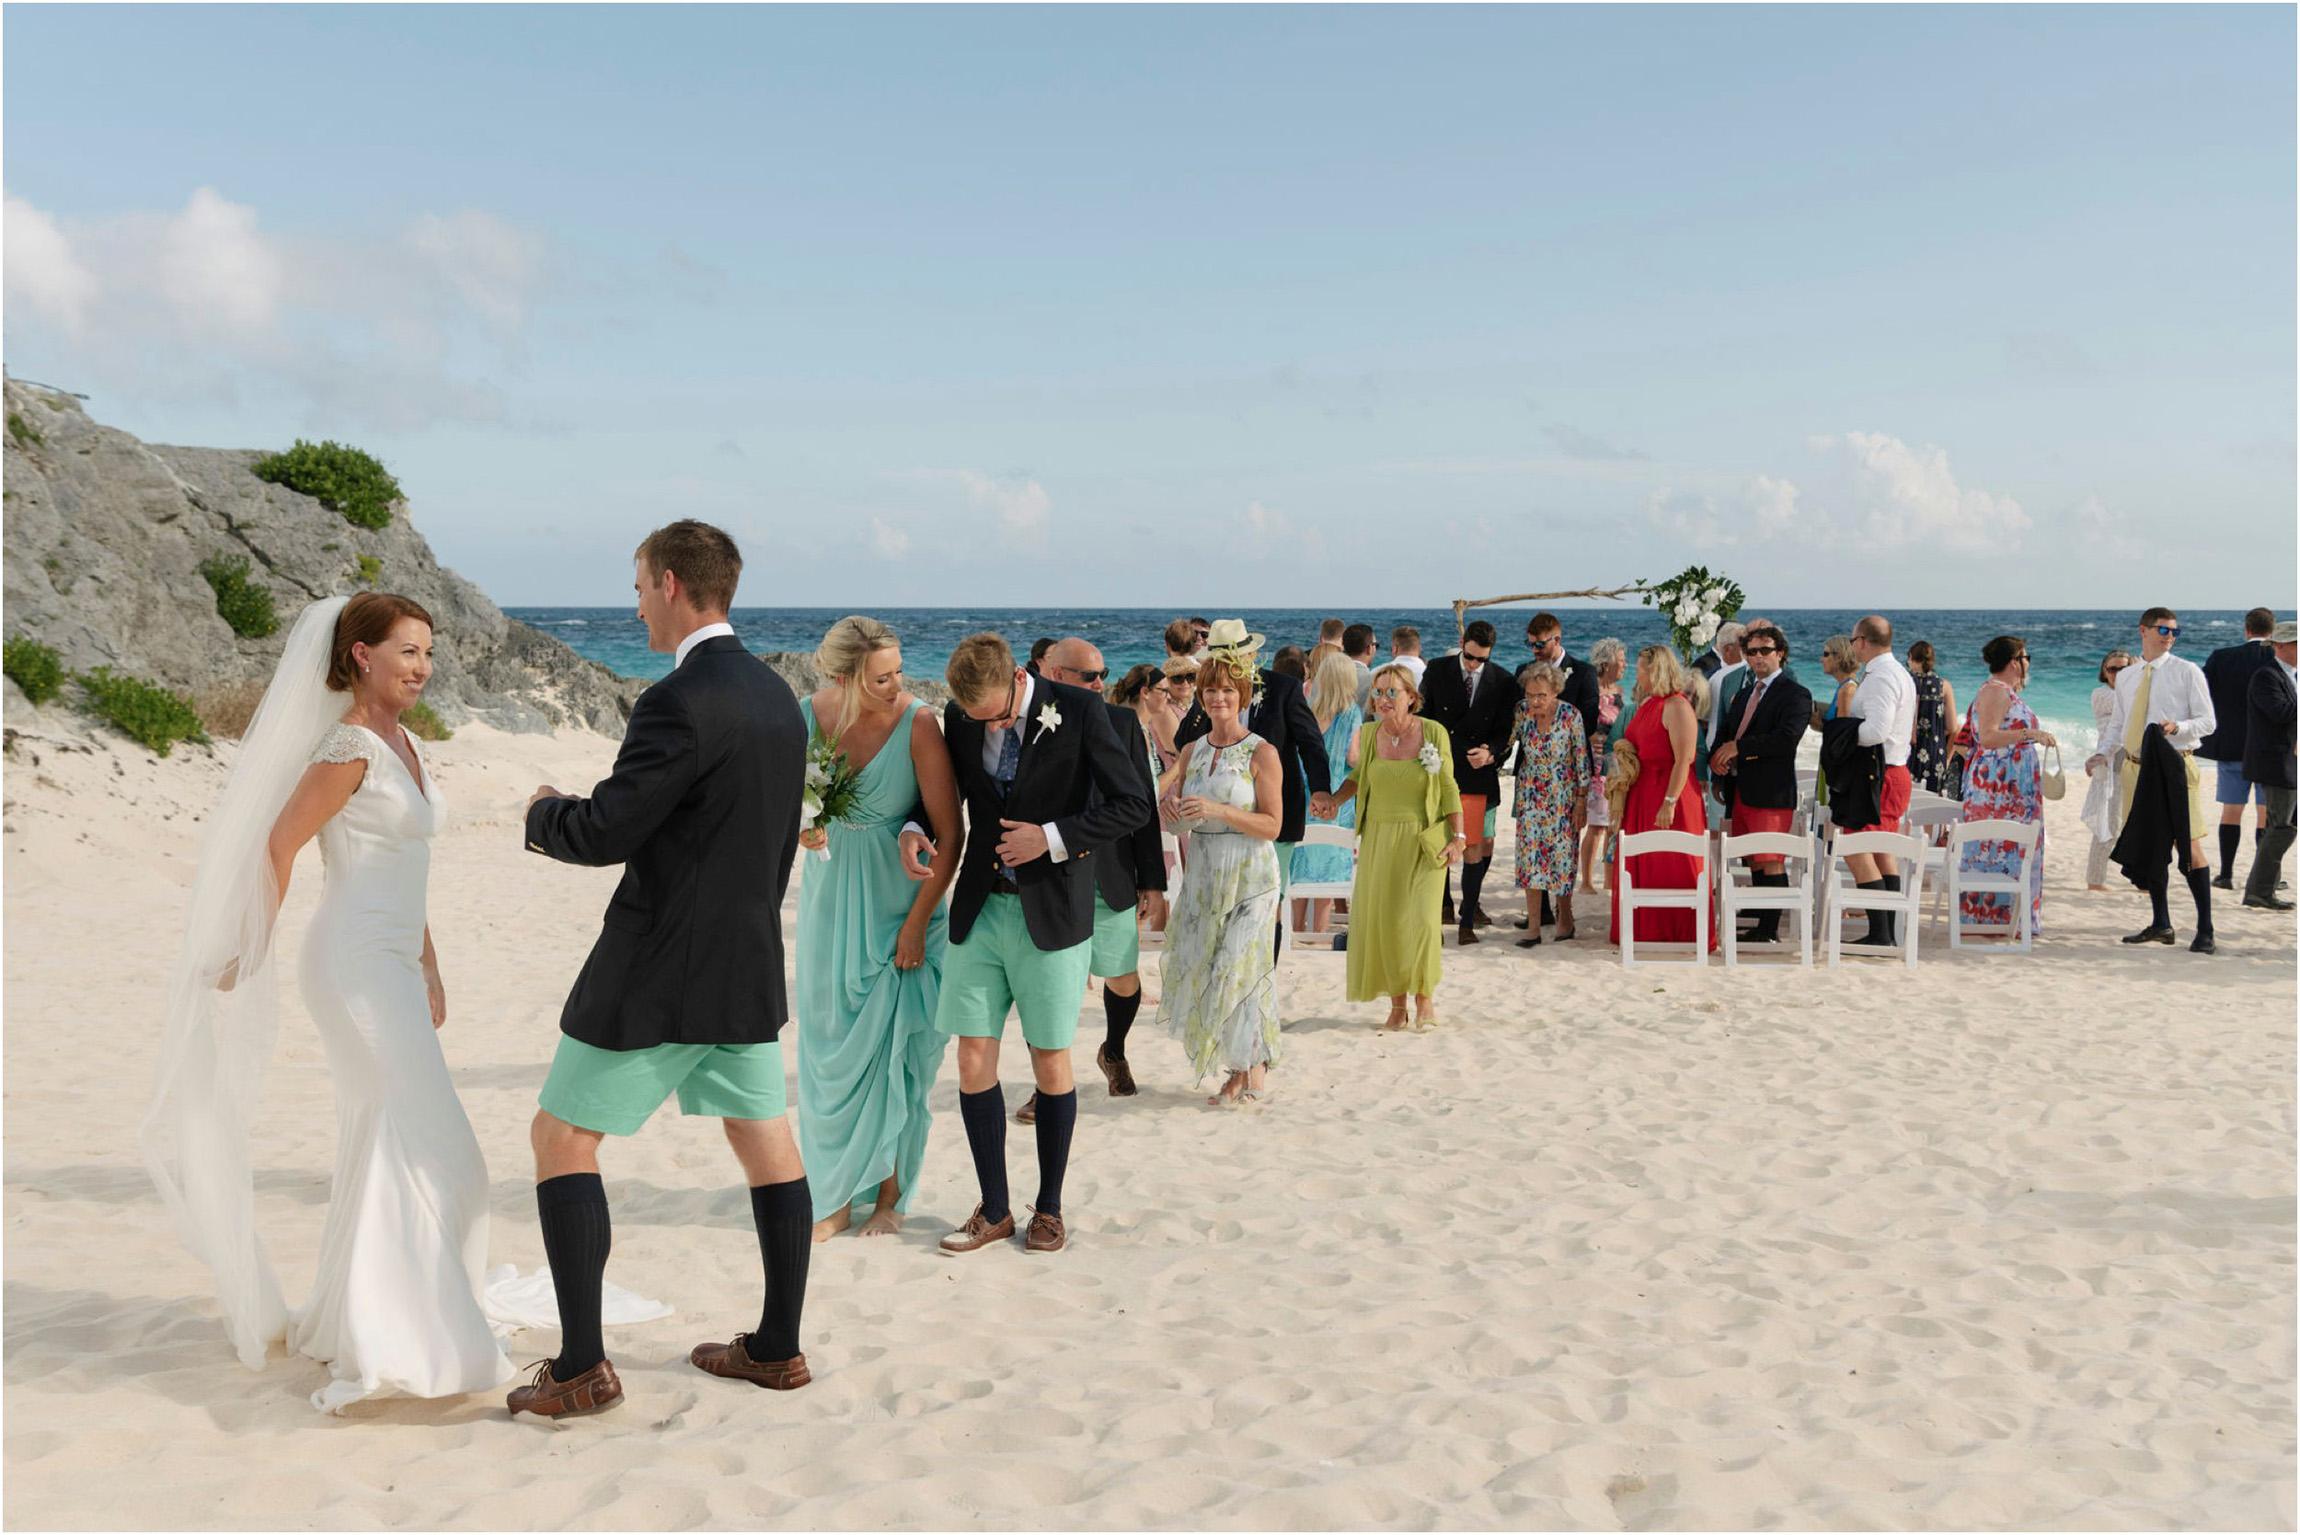 ©FianderFoto_Bermuda Wedding Photographer_Mid Ocean_Rachel_Angus_057.jpg